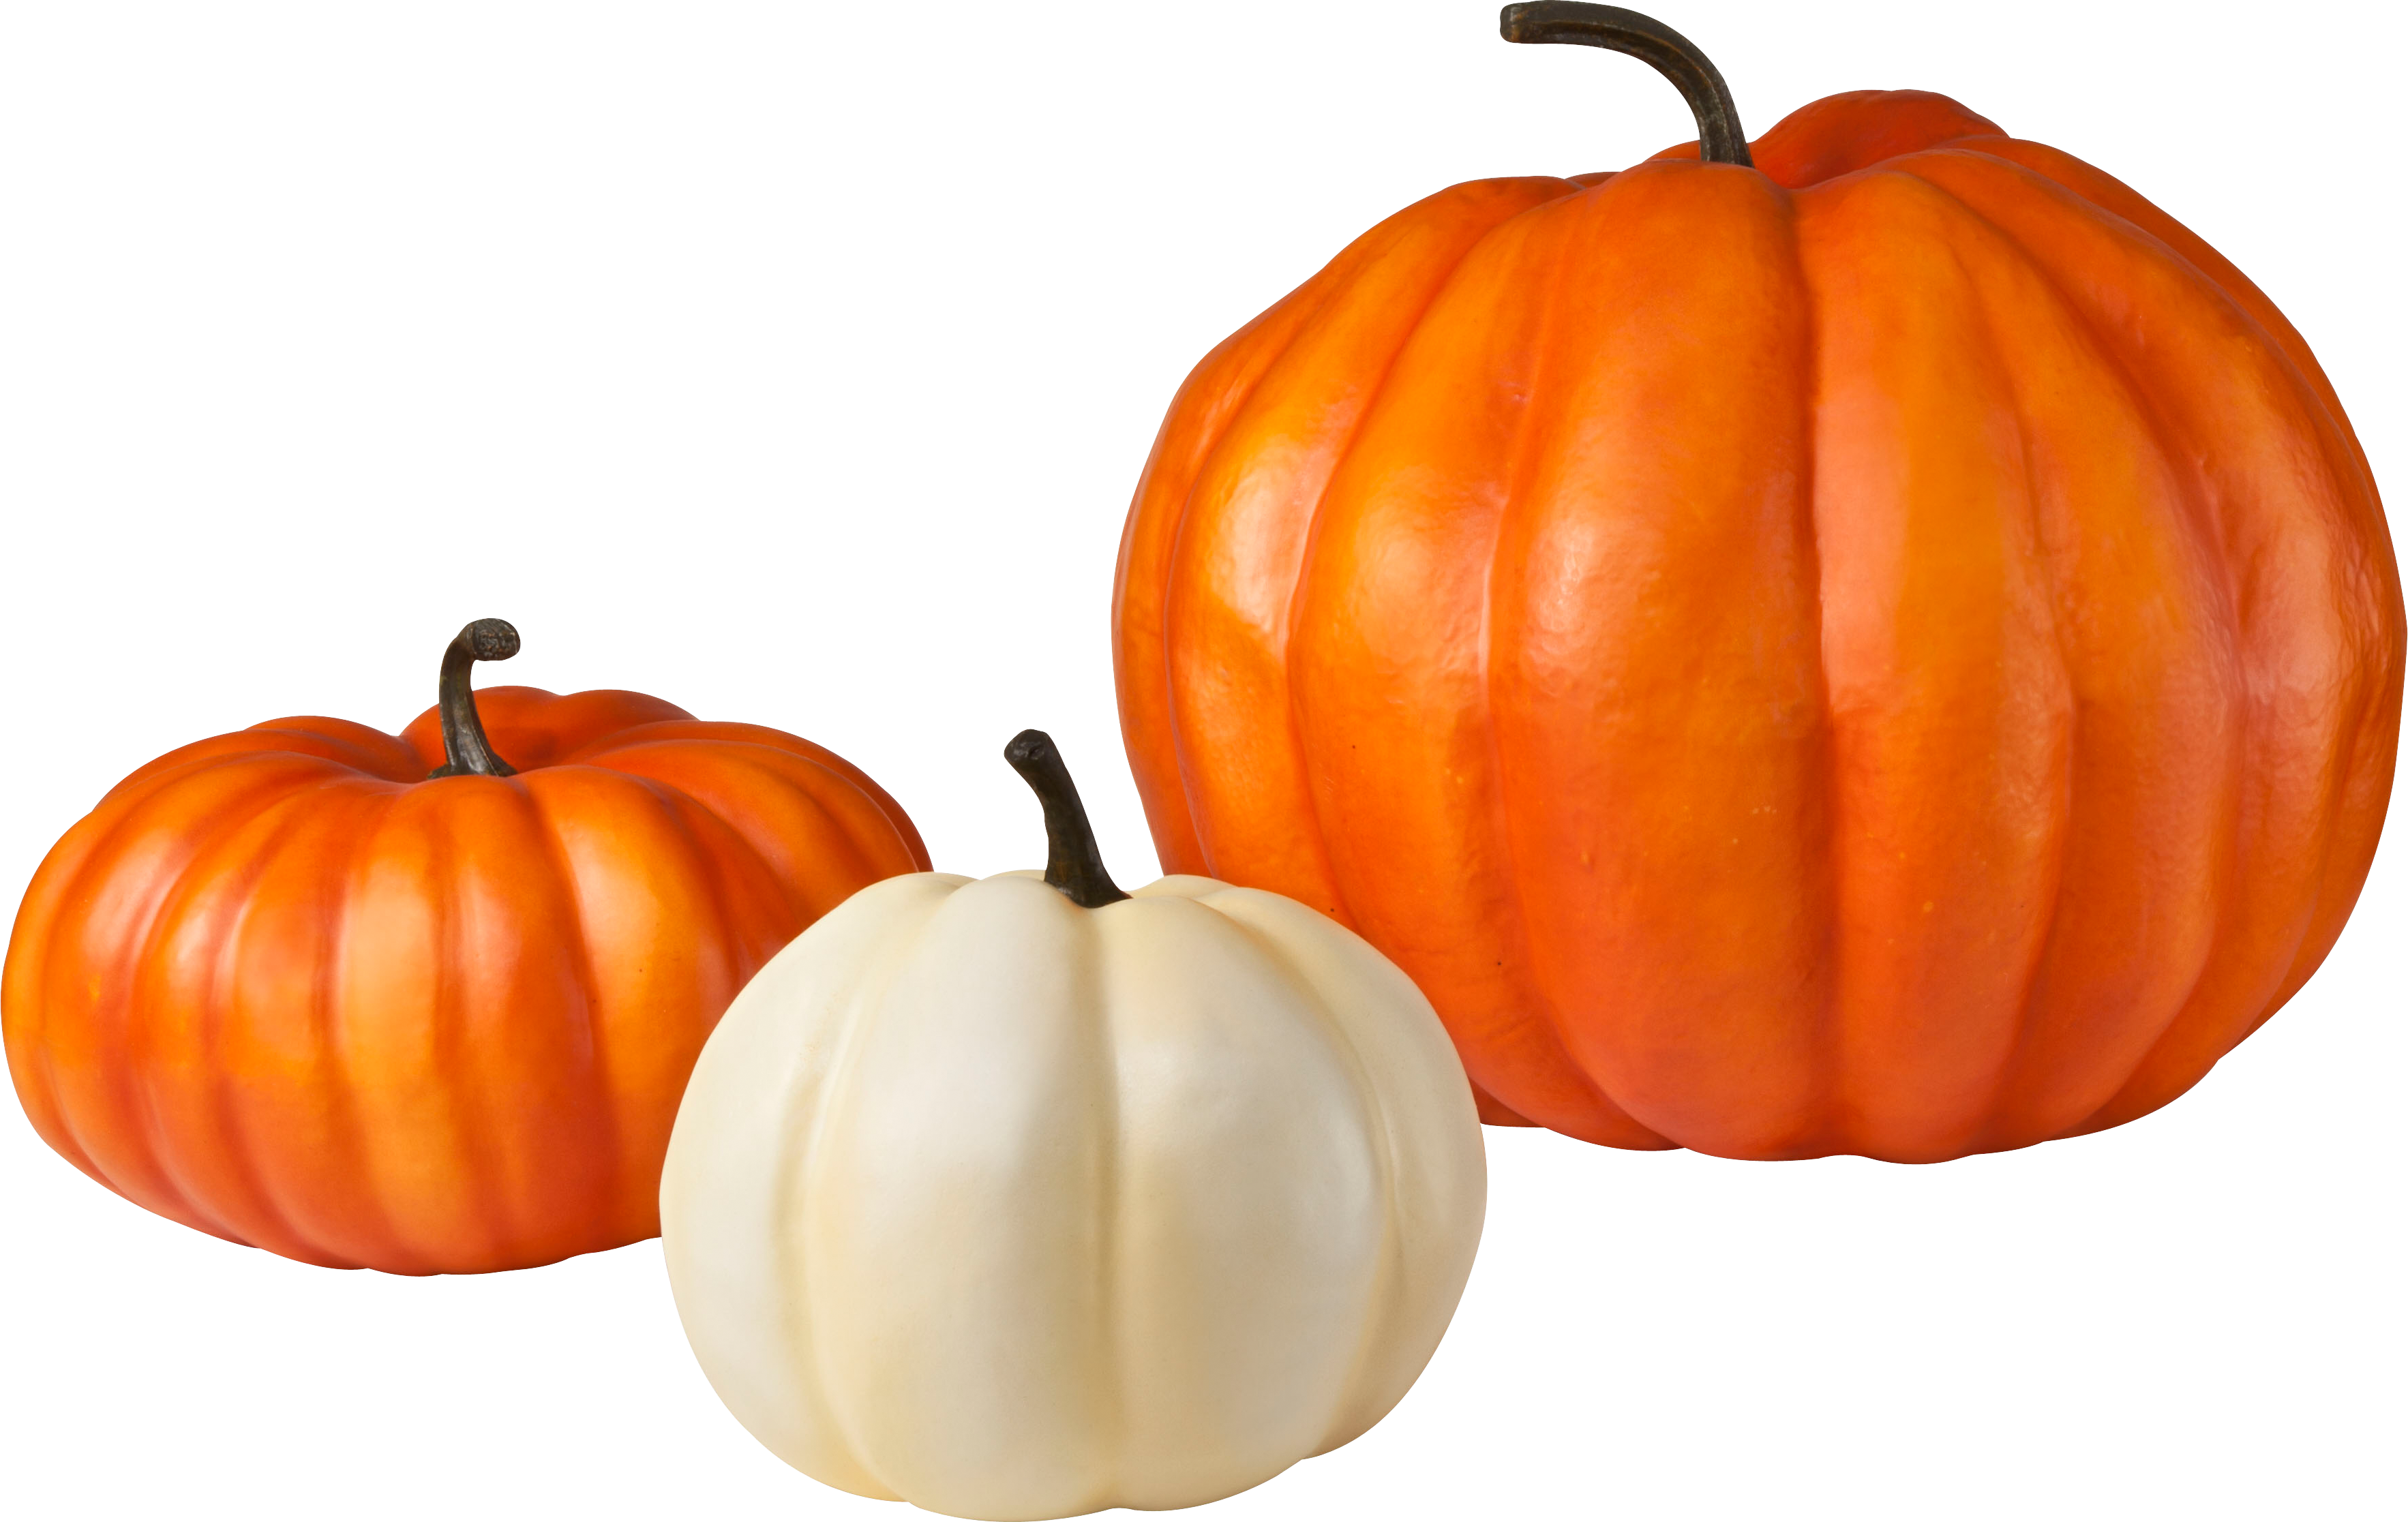 pumpkin png image purepng free transparent cc0 png orange juice brands logos orange juice company logos